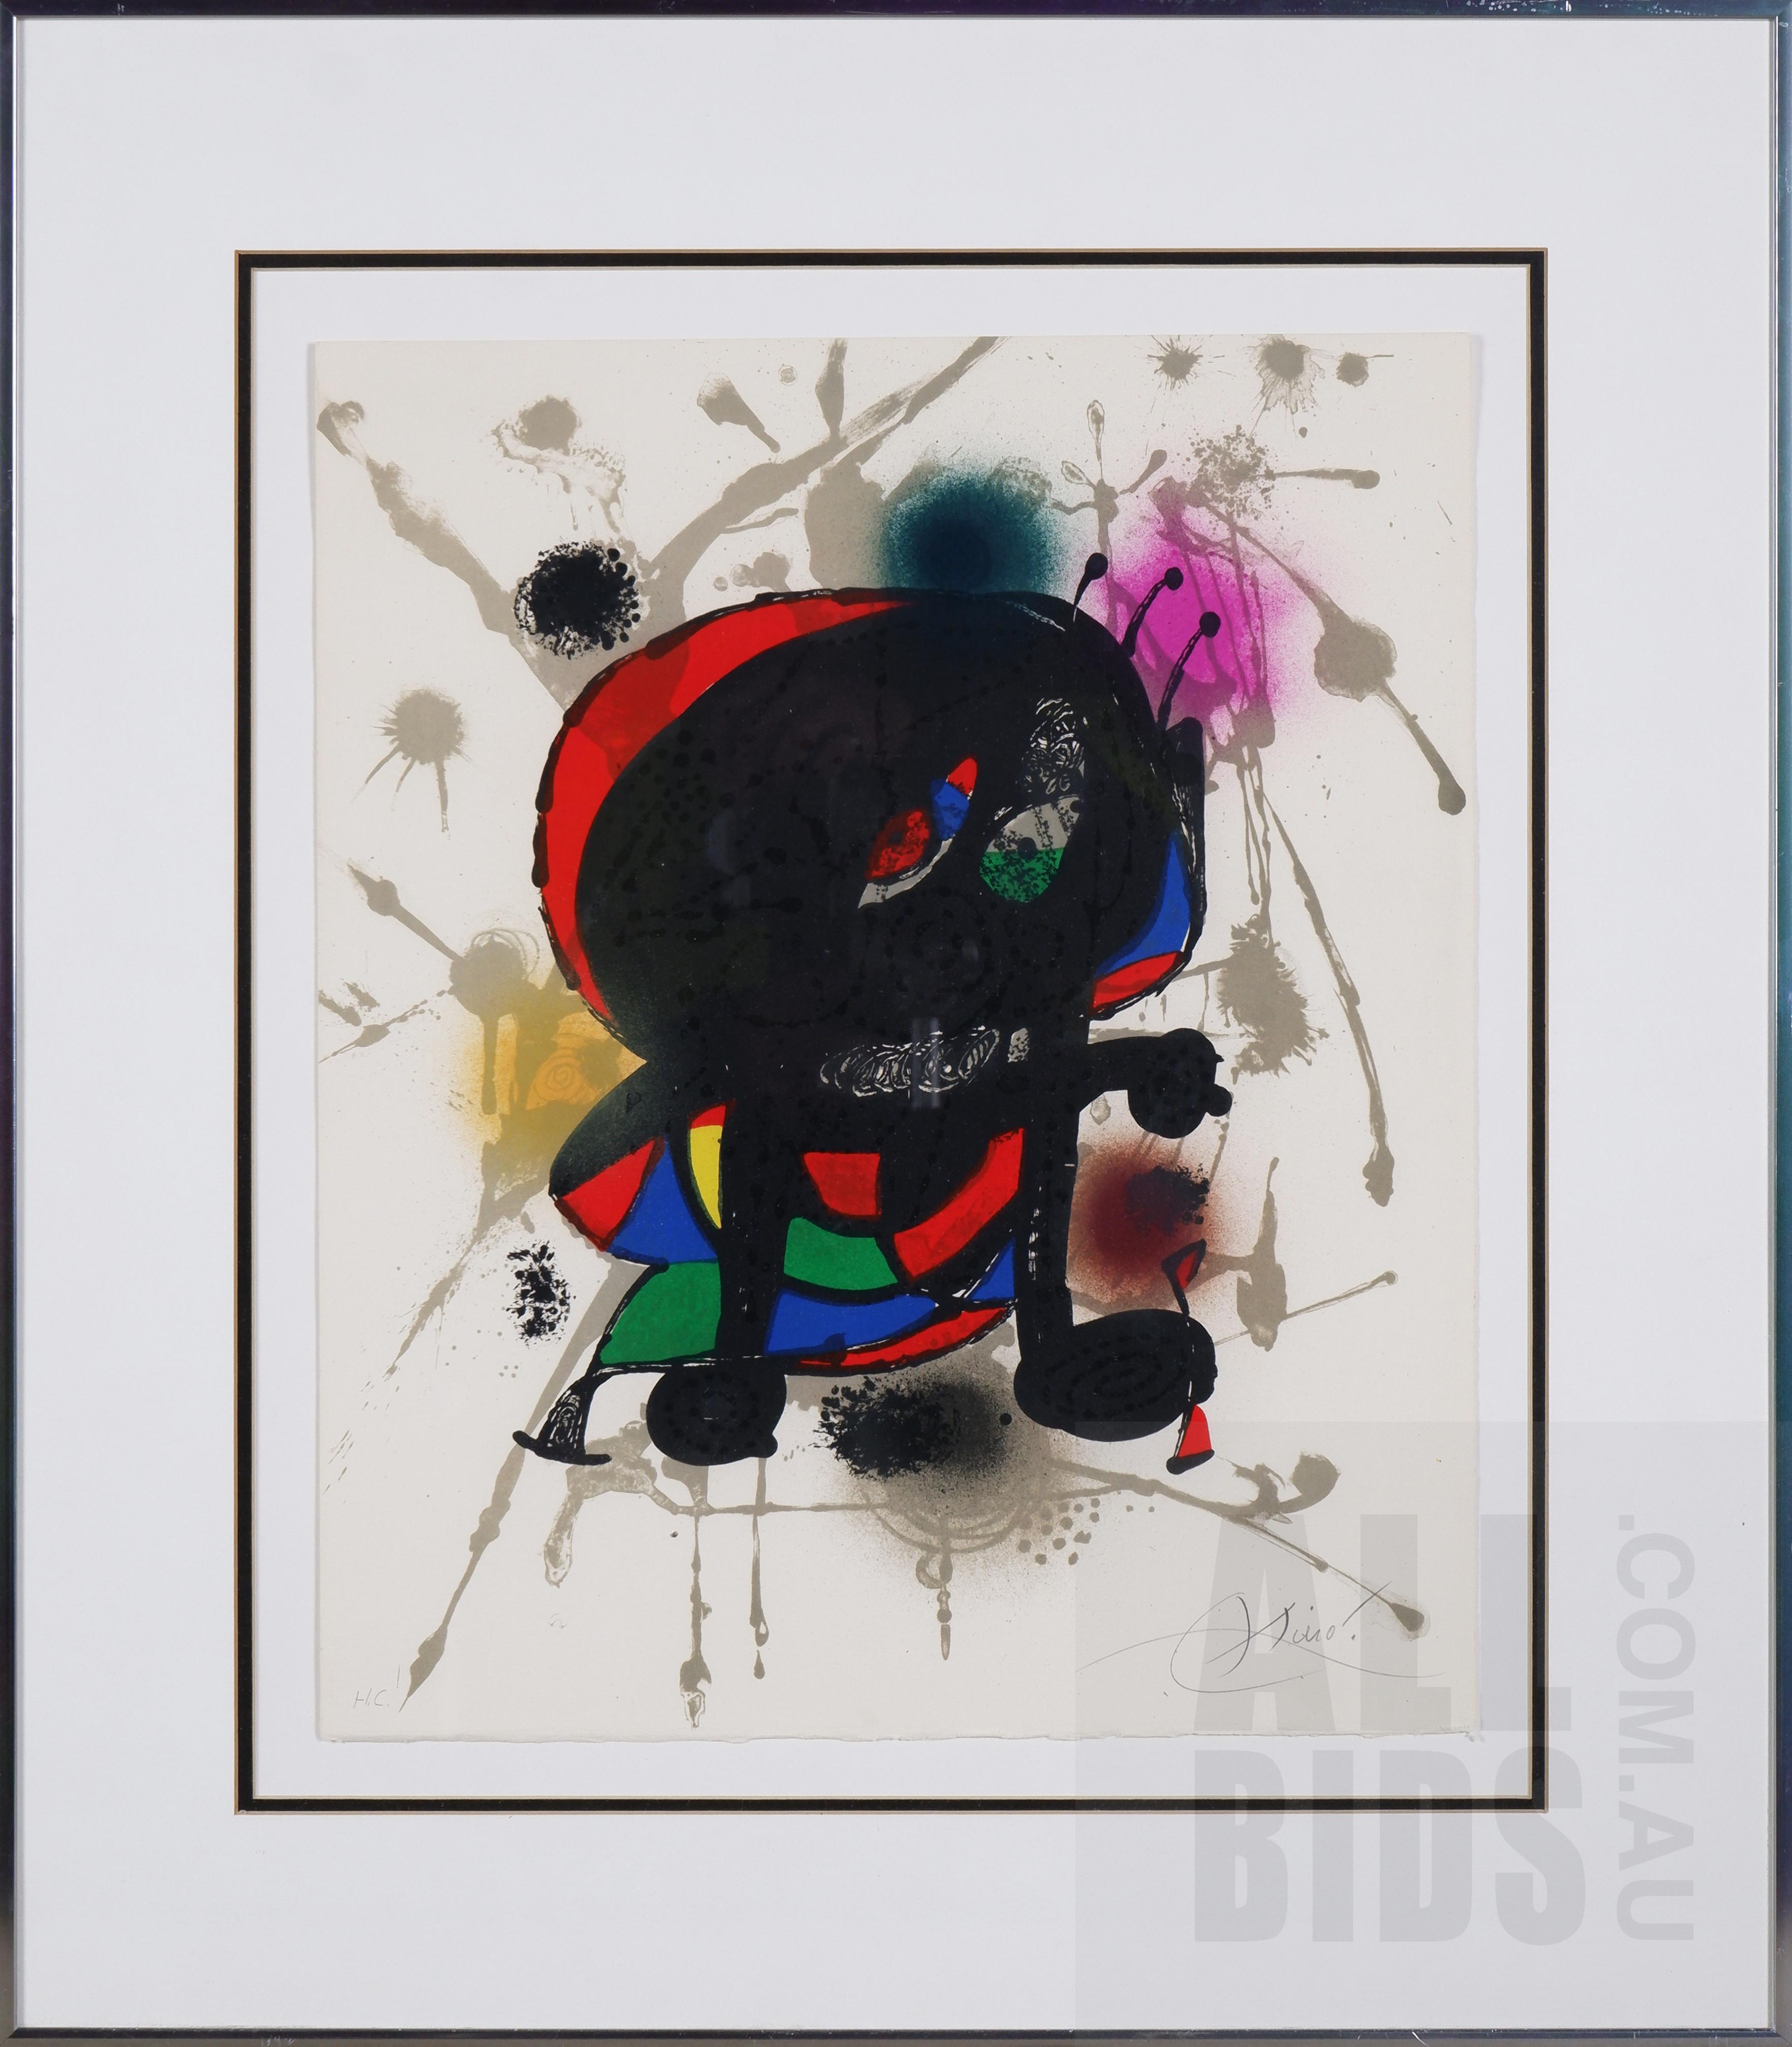 'Joan Miro (1893-1983, Spanish), Original Litografica III 1977, Lithograph, 45 x 37 cm (sheet size)'